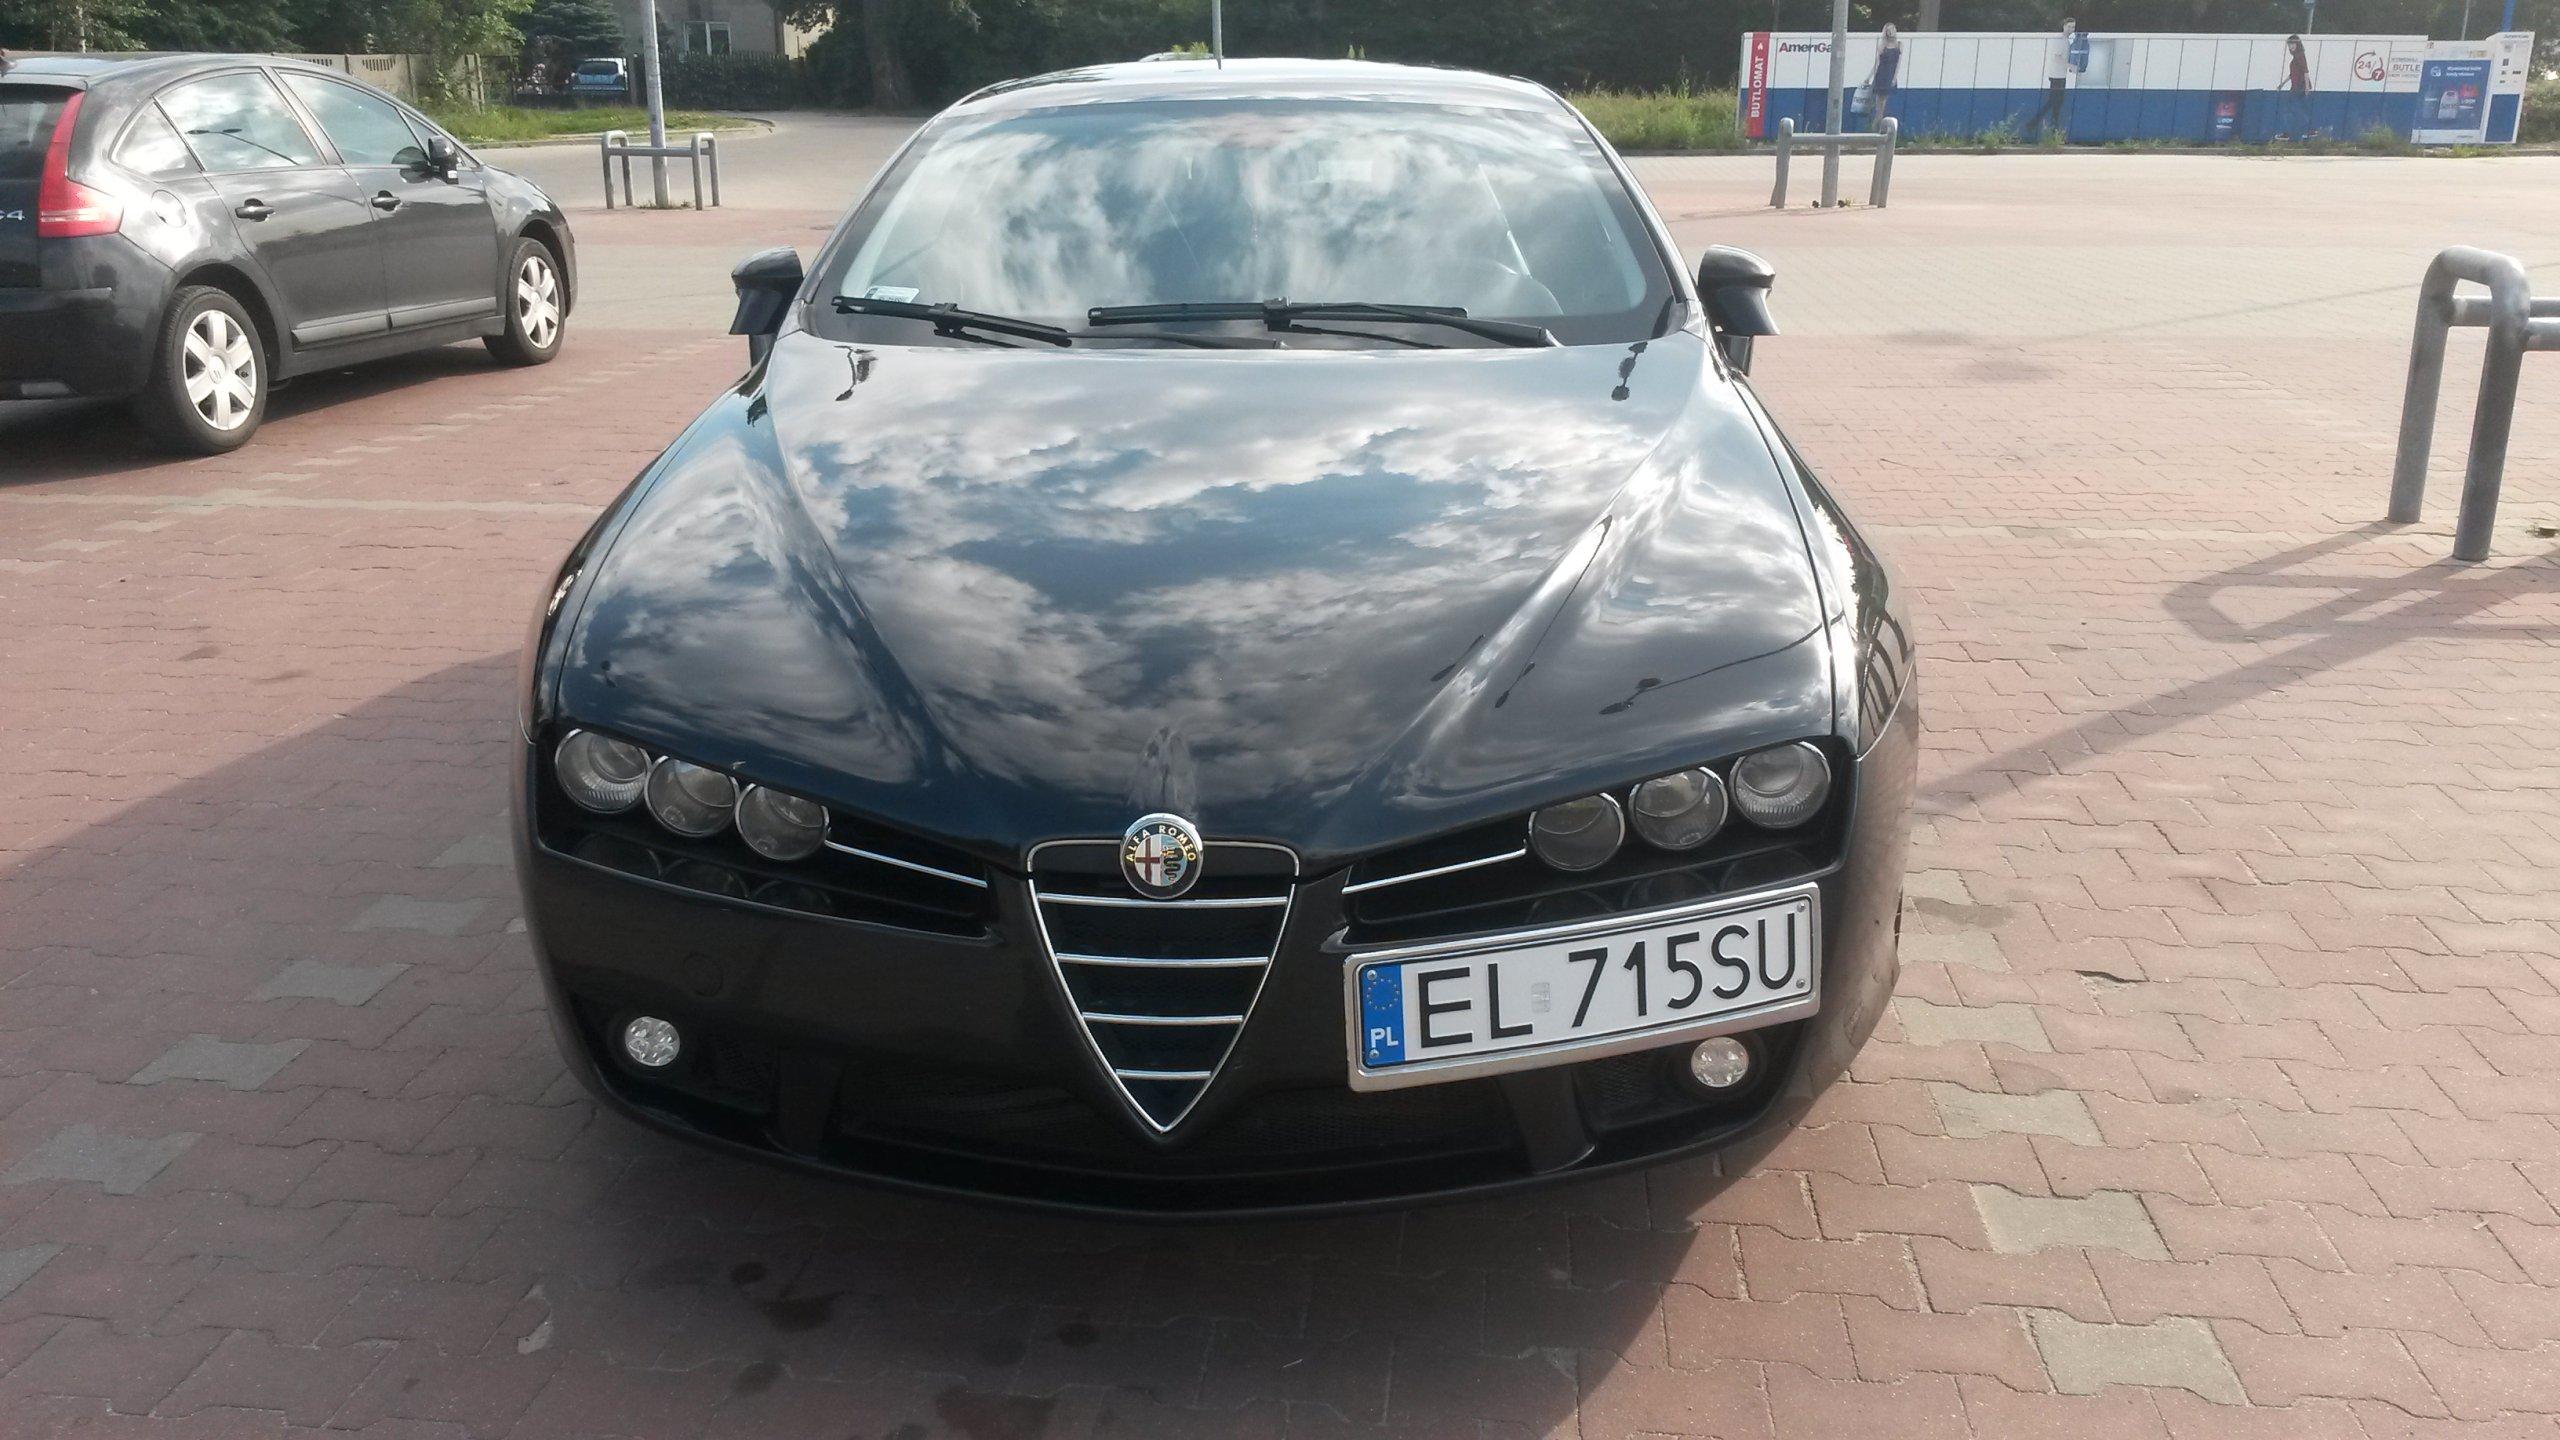 Alfa Romeo Brera 2 4 JTDM 2006 r oficjalne archiwum